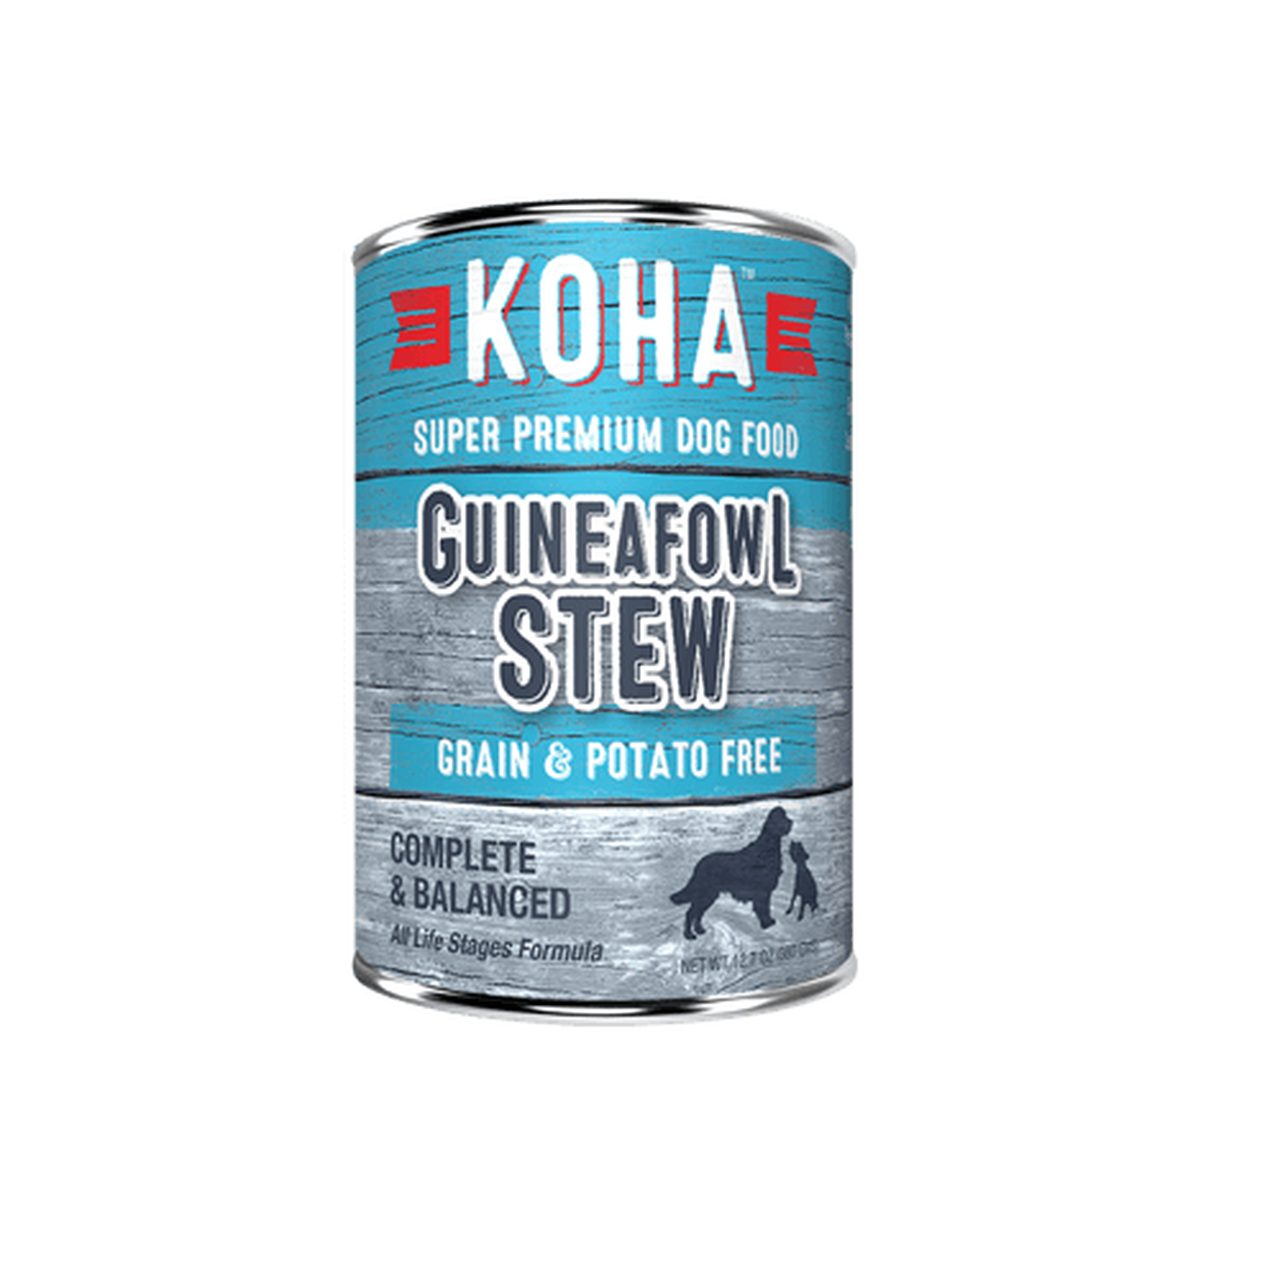 Koha Koha Dog Can Grain Free Guineafowl Stew 12.7 oz Product Image